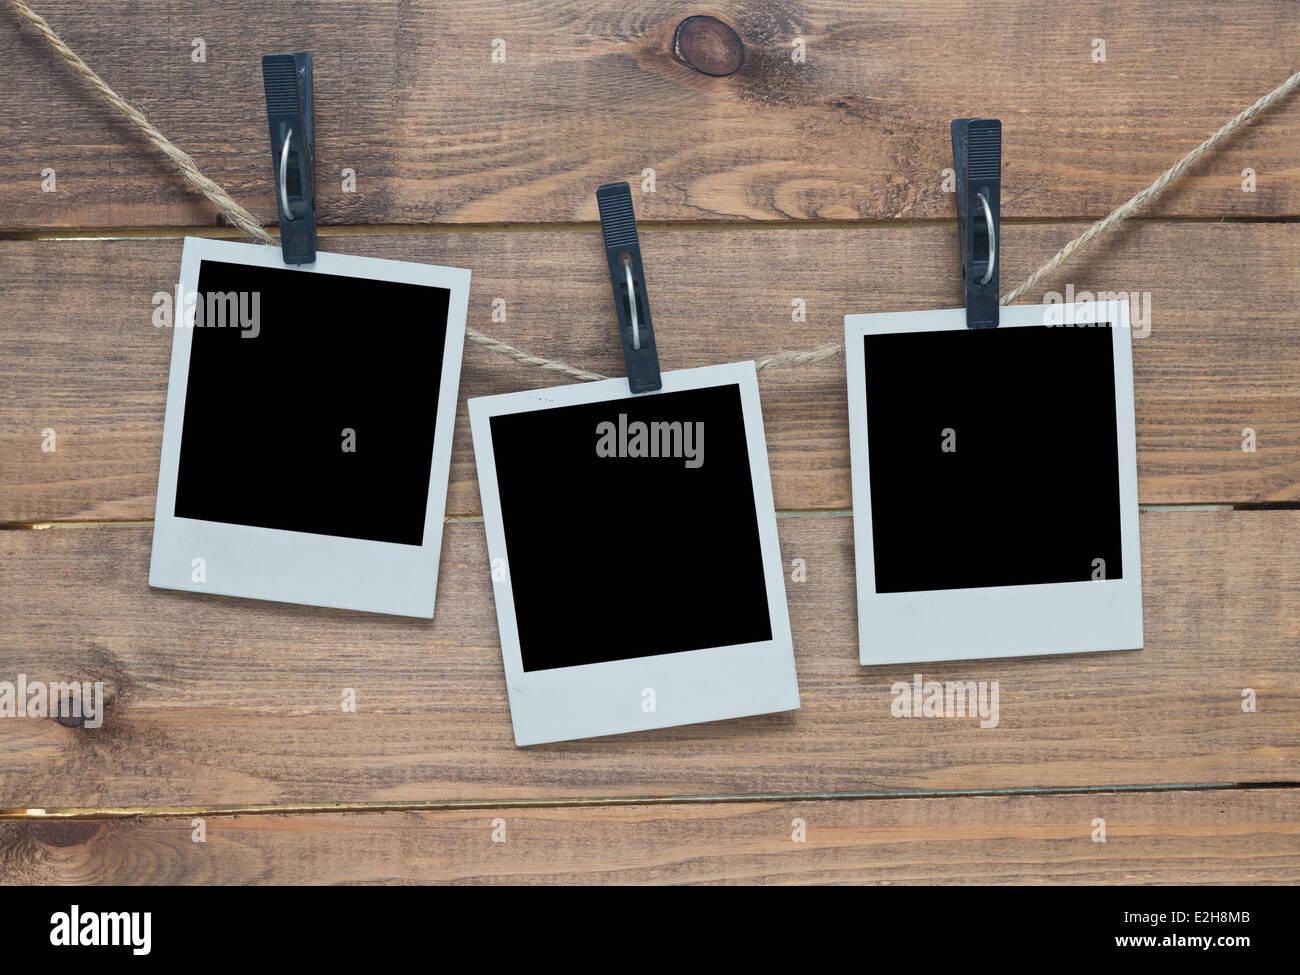 leere Polaroid-Foto-Rahmen auf hölzernen Hintergrund Stockfoto, Bild ...